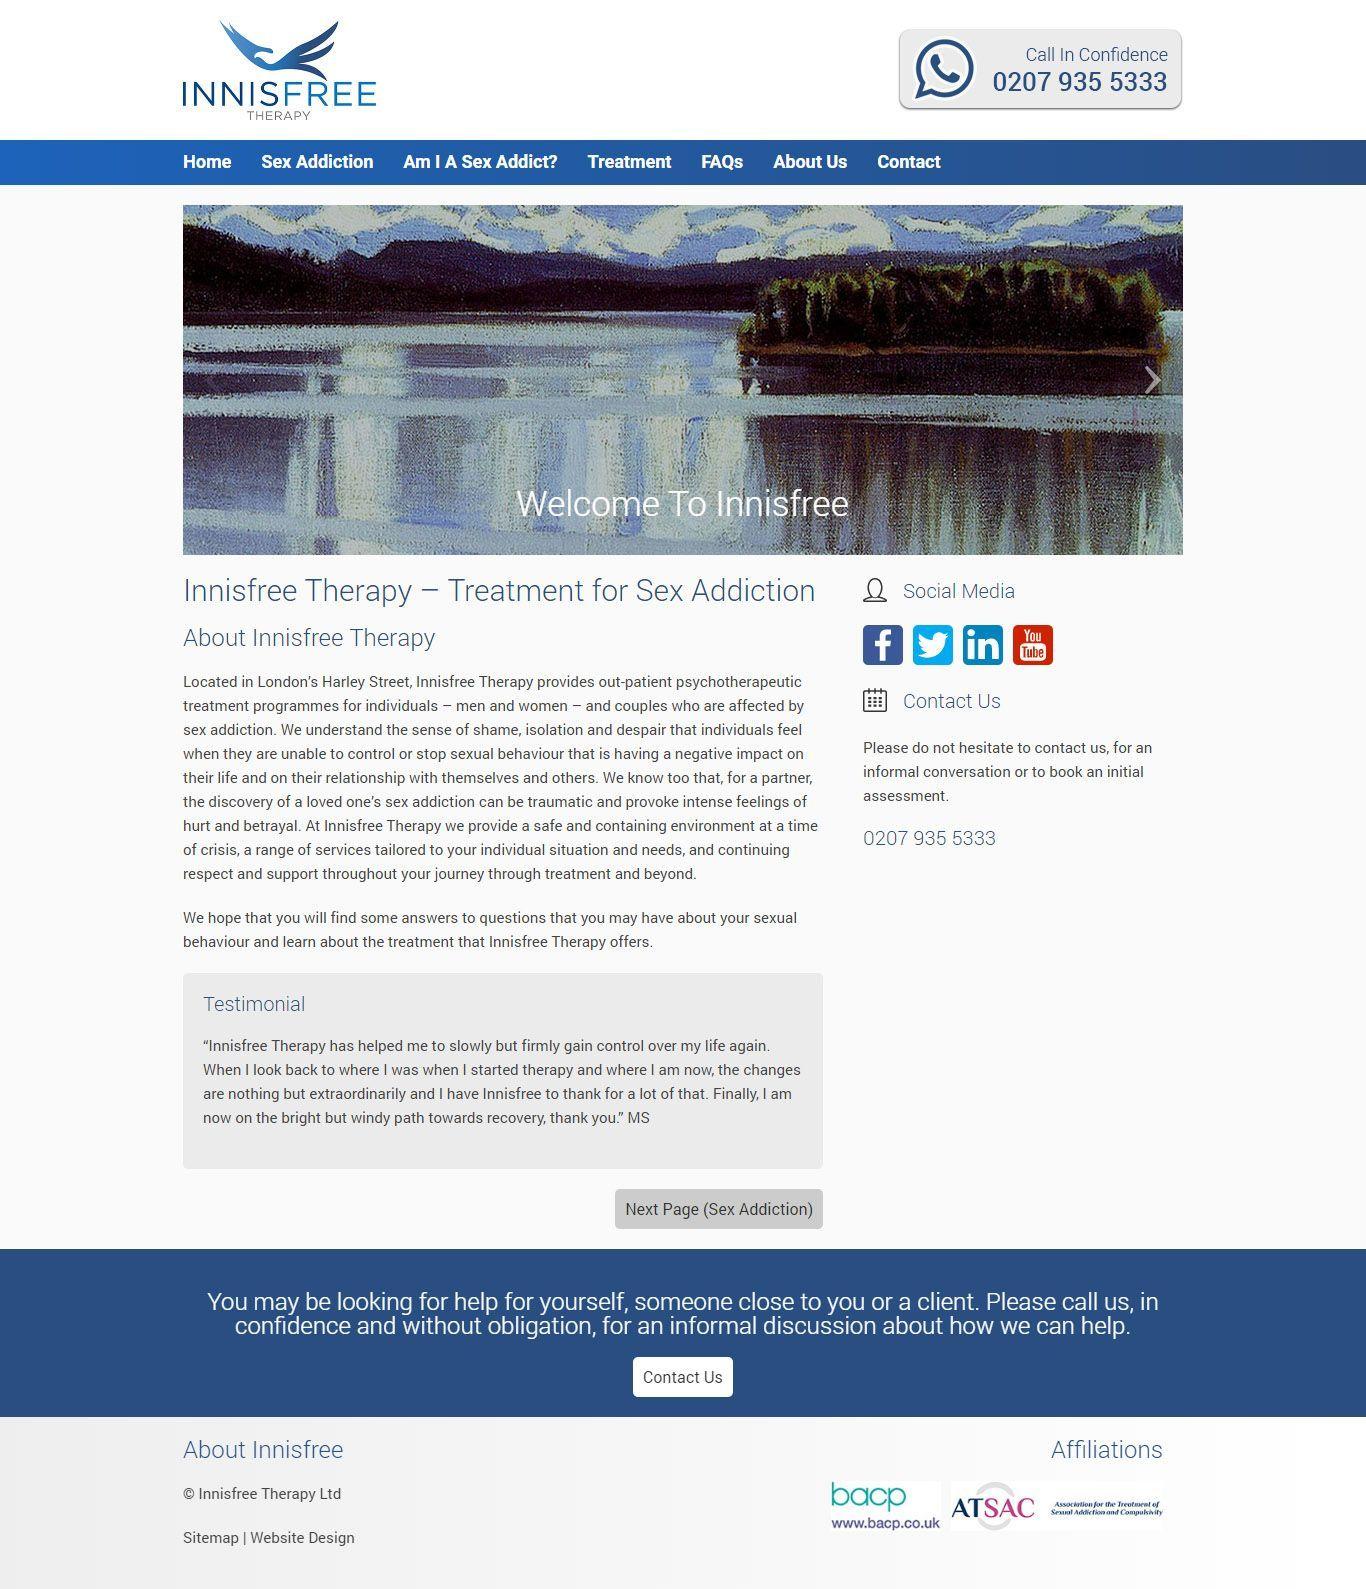 innisfree-london-web-design